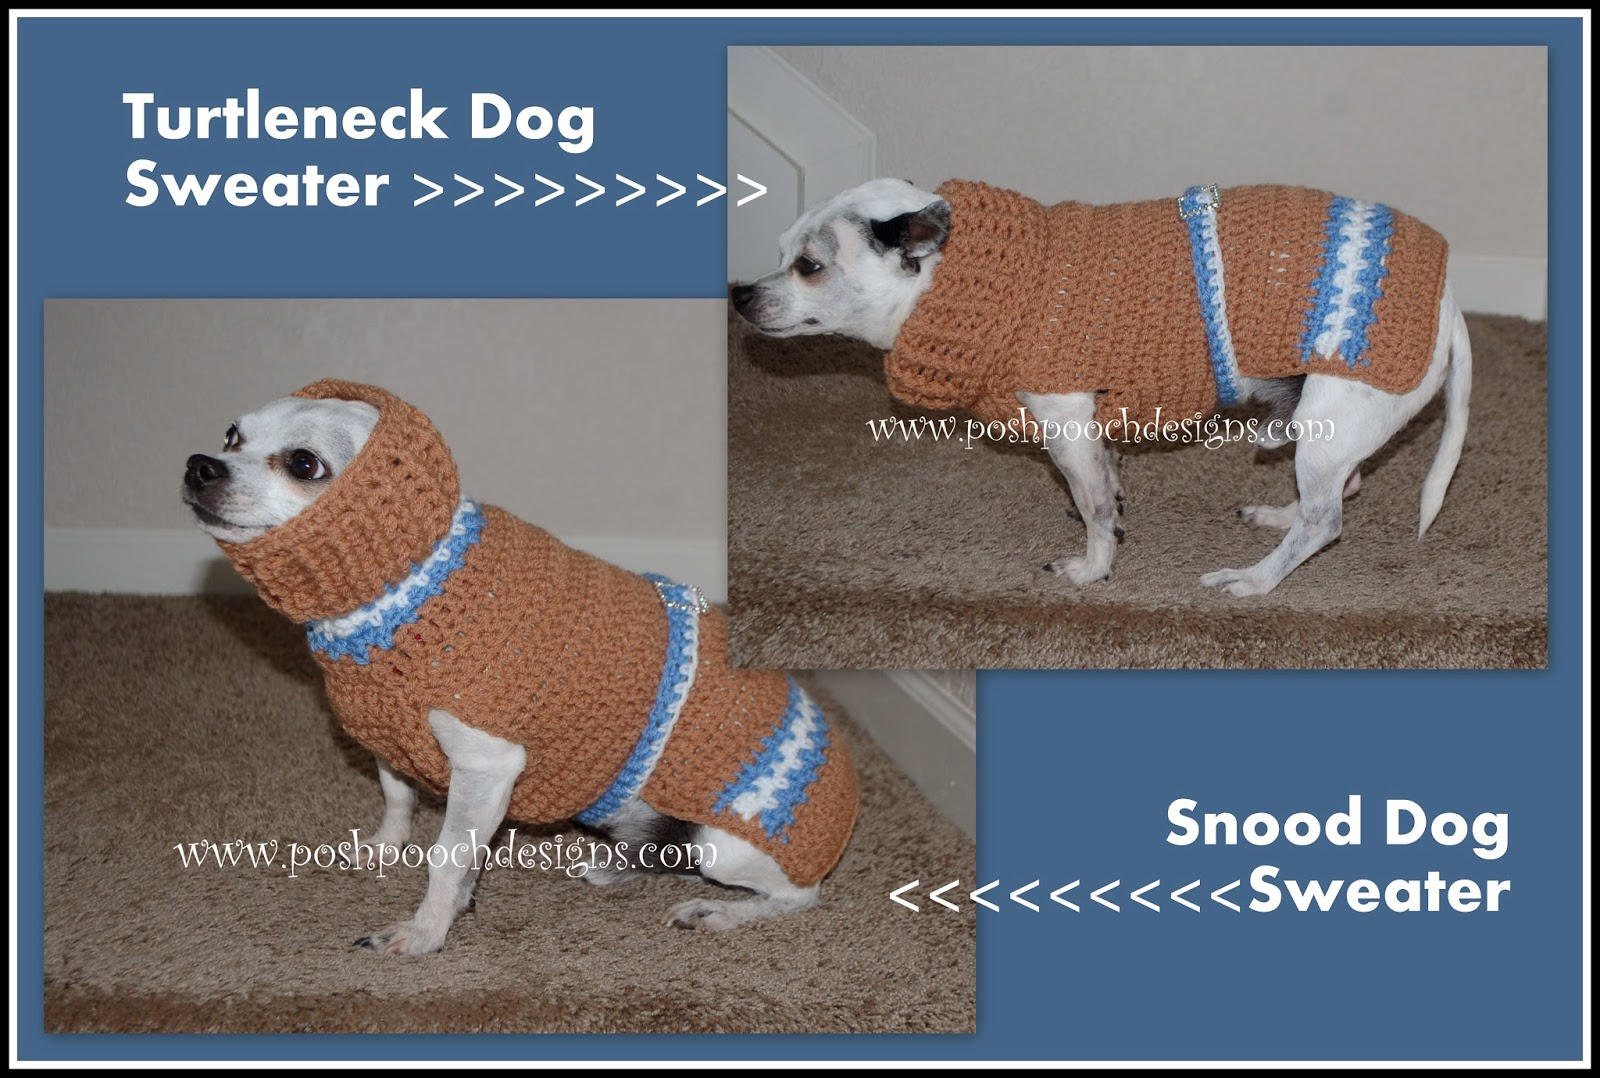 Free Crochet Pattern Dog Snood : Posh Pooch Designs Dog Clothes: Snood Turtle Neck Dog ...